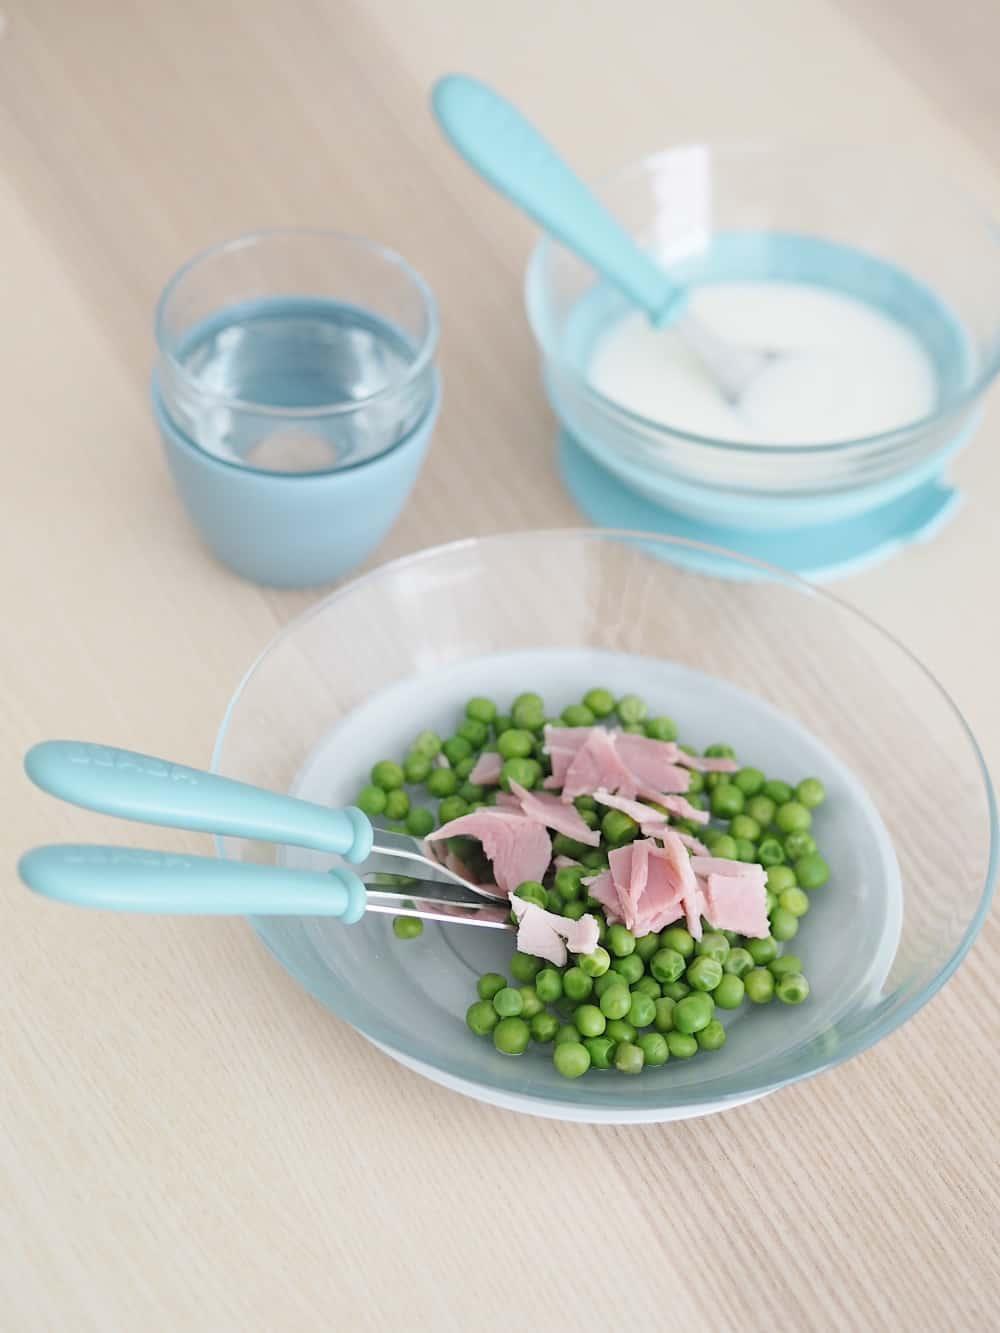 Beaba 3-Piece Glass Suction Baby Feeding Set Rain on Kitchen Table With Food